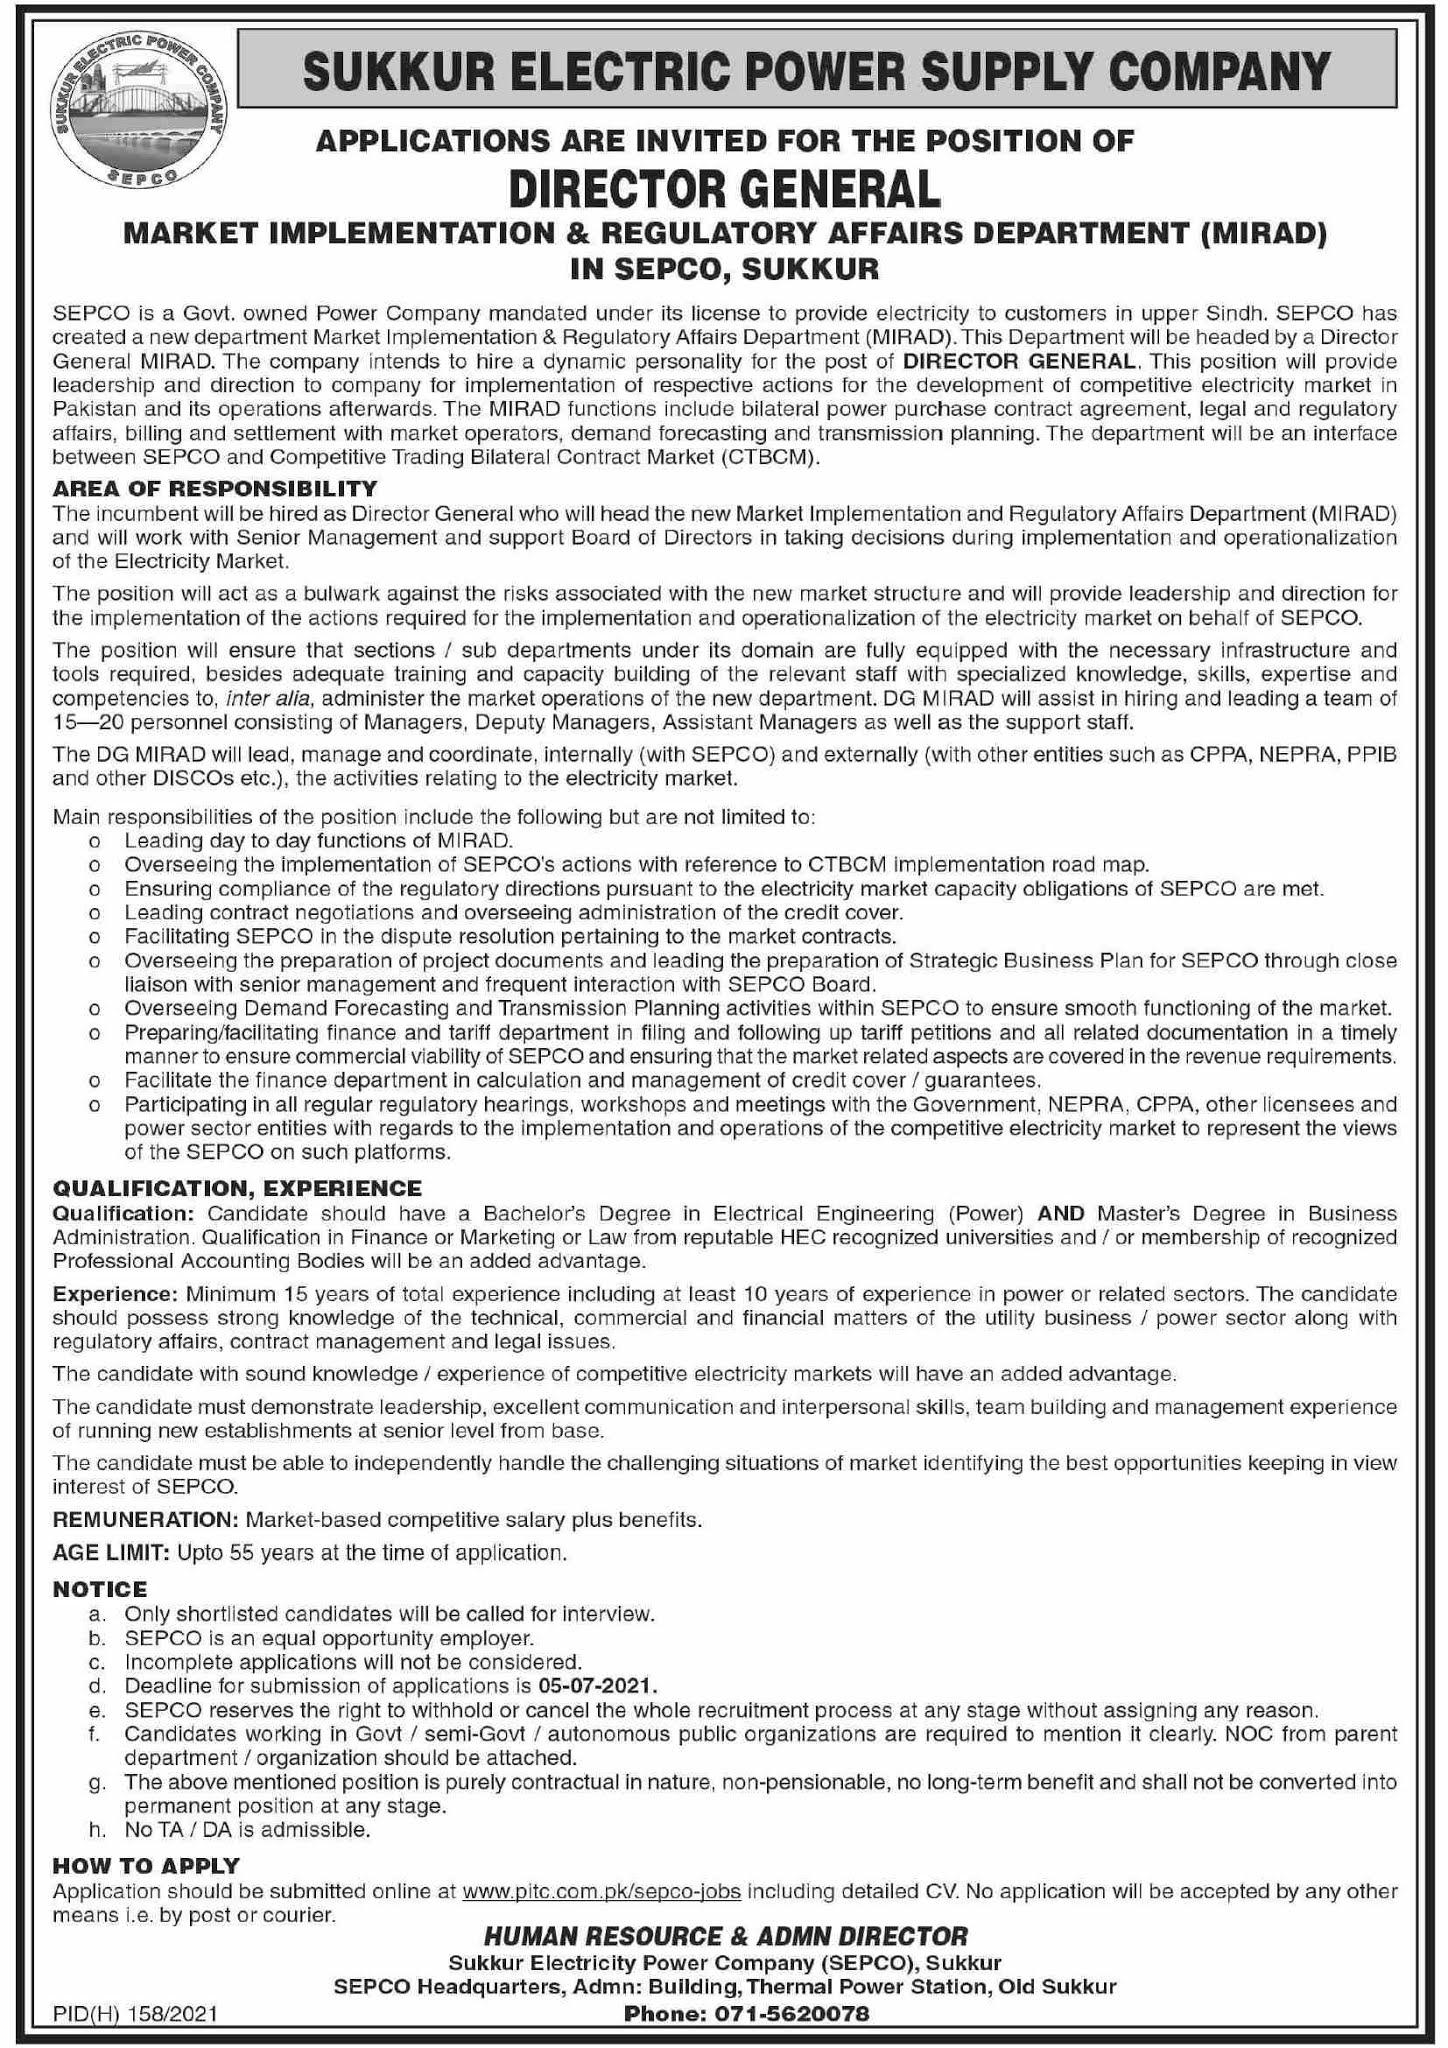 www.pitc.com.pk Jobs 2021 - Sukkur Electric Power Supply Company (SEPCO) Jobs 2021 in Pakistan